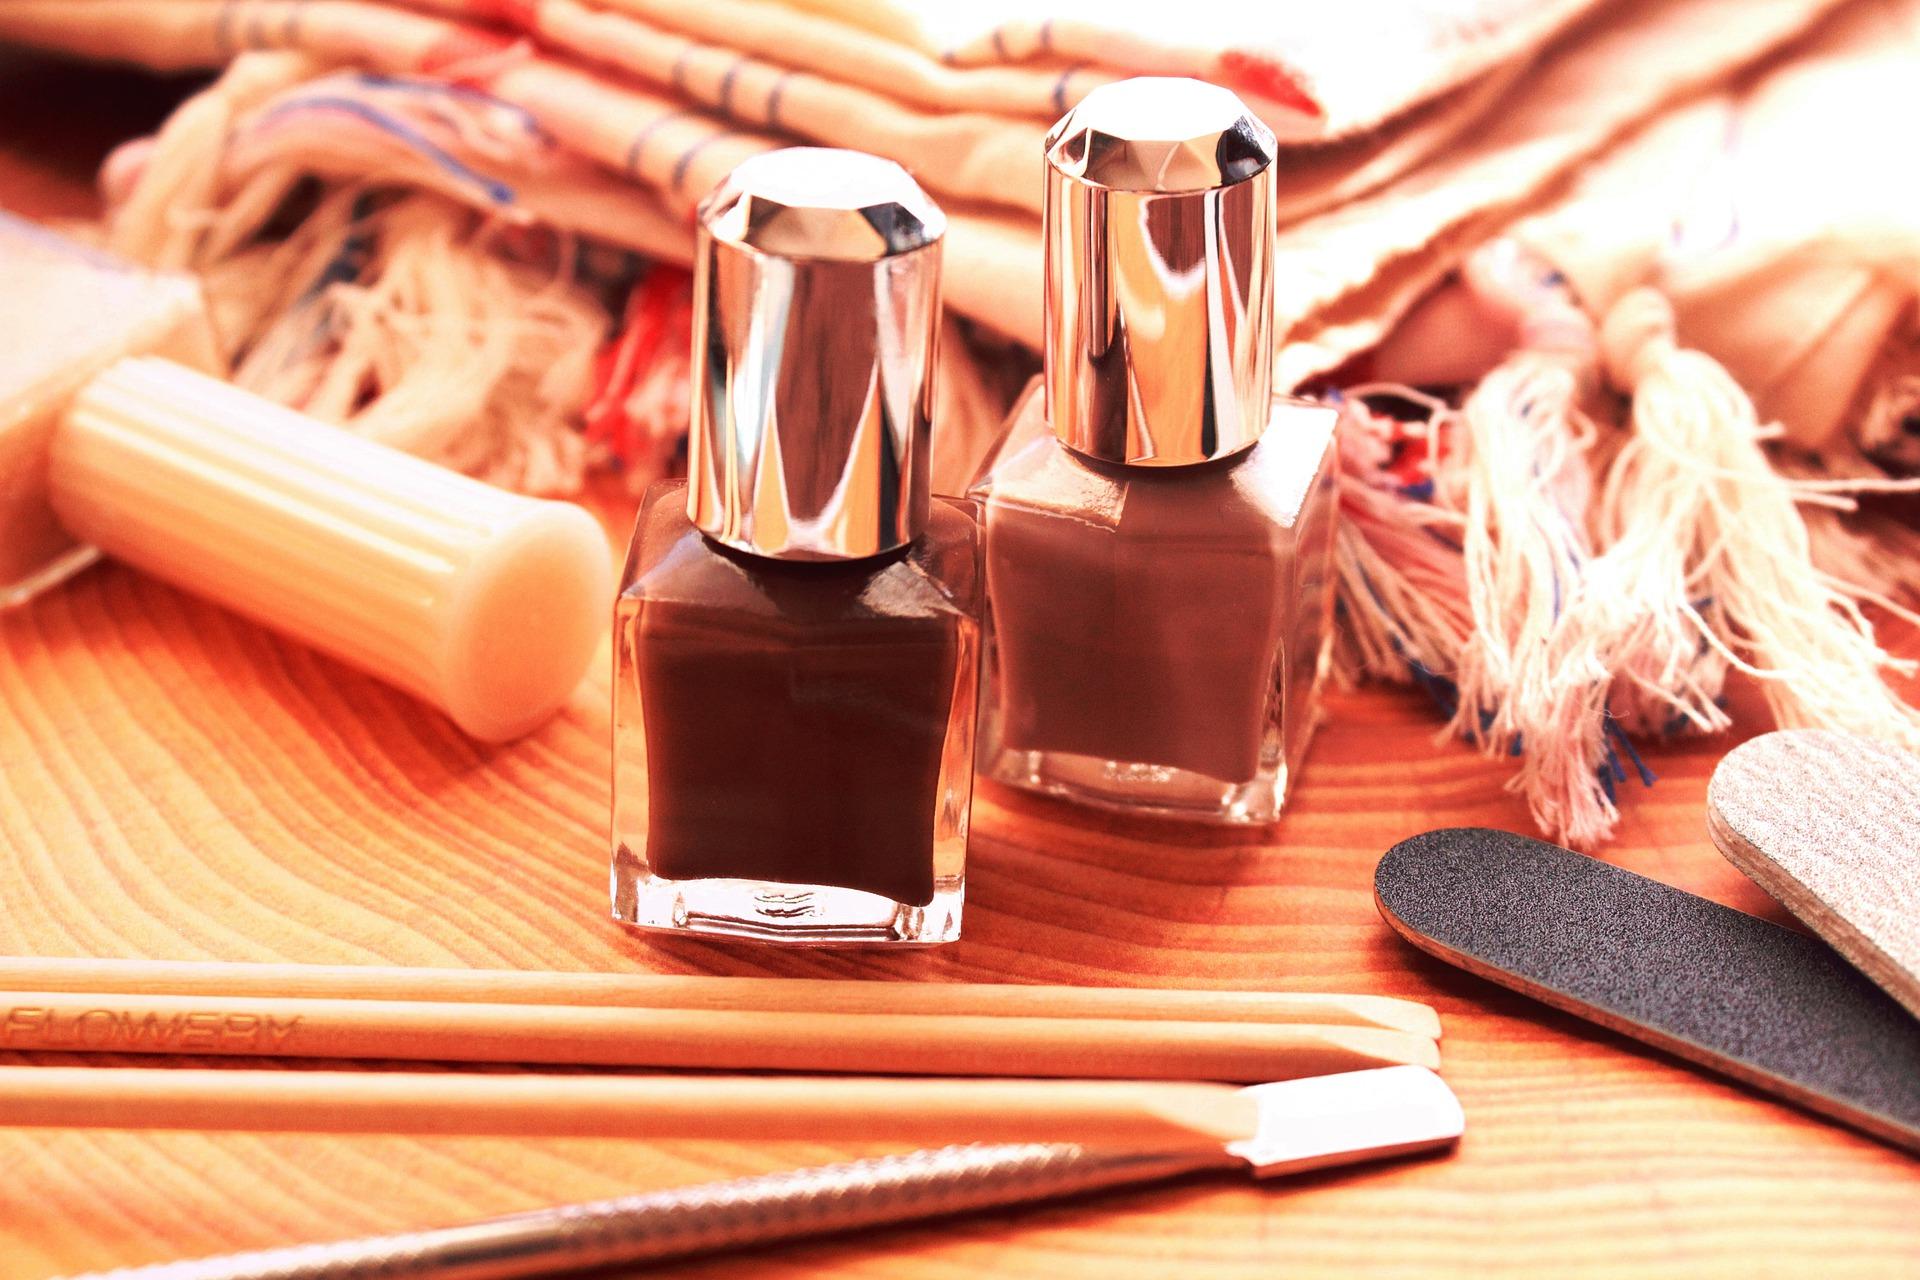 Foto de frascos de esmaltes e acessórios para fazer unha. Imagem ilustrativa para o texto como remover manchas no carpete.